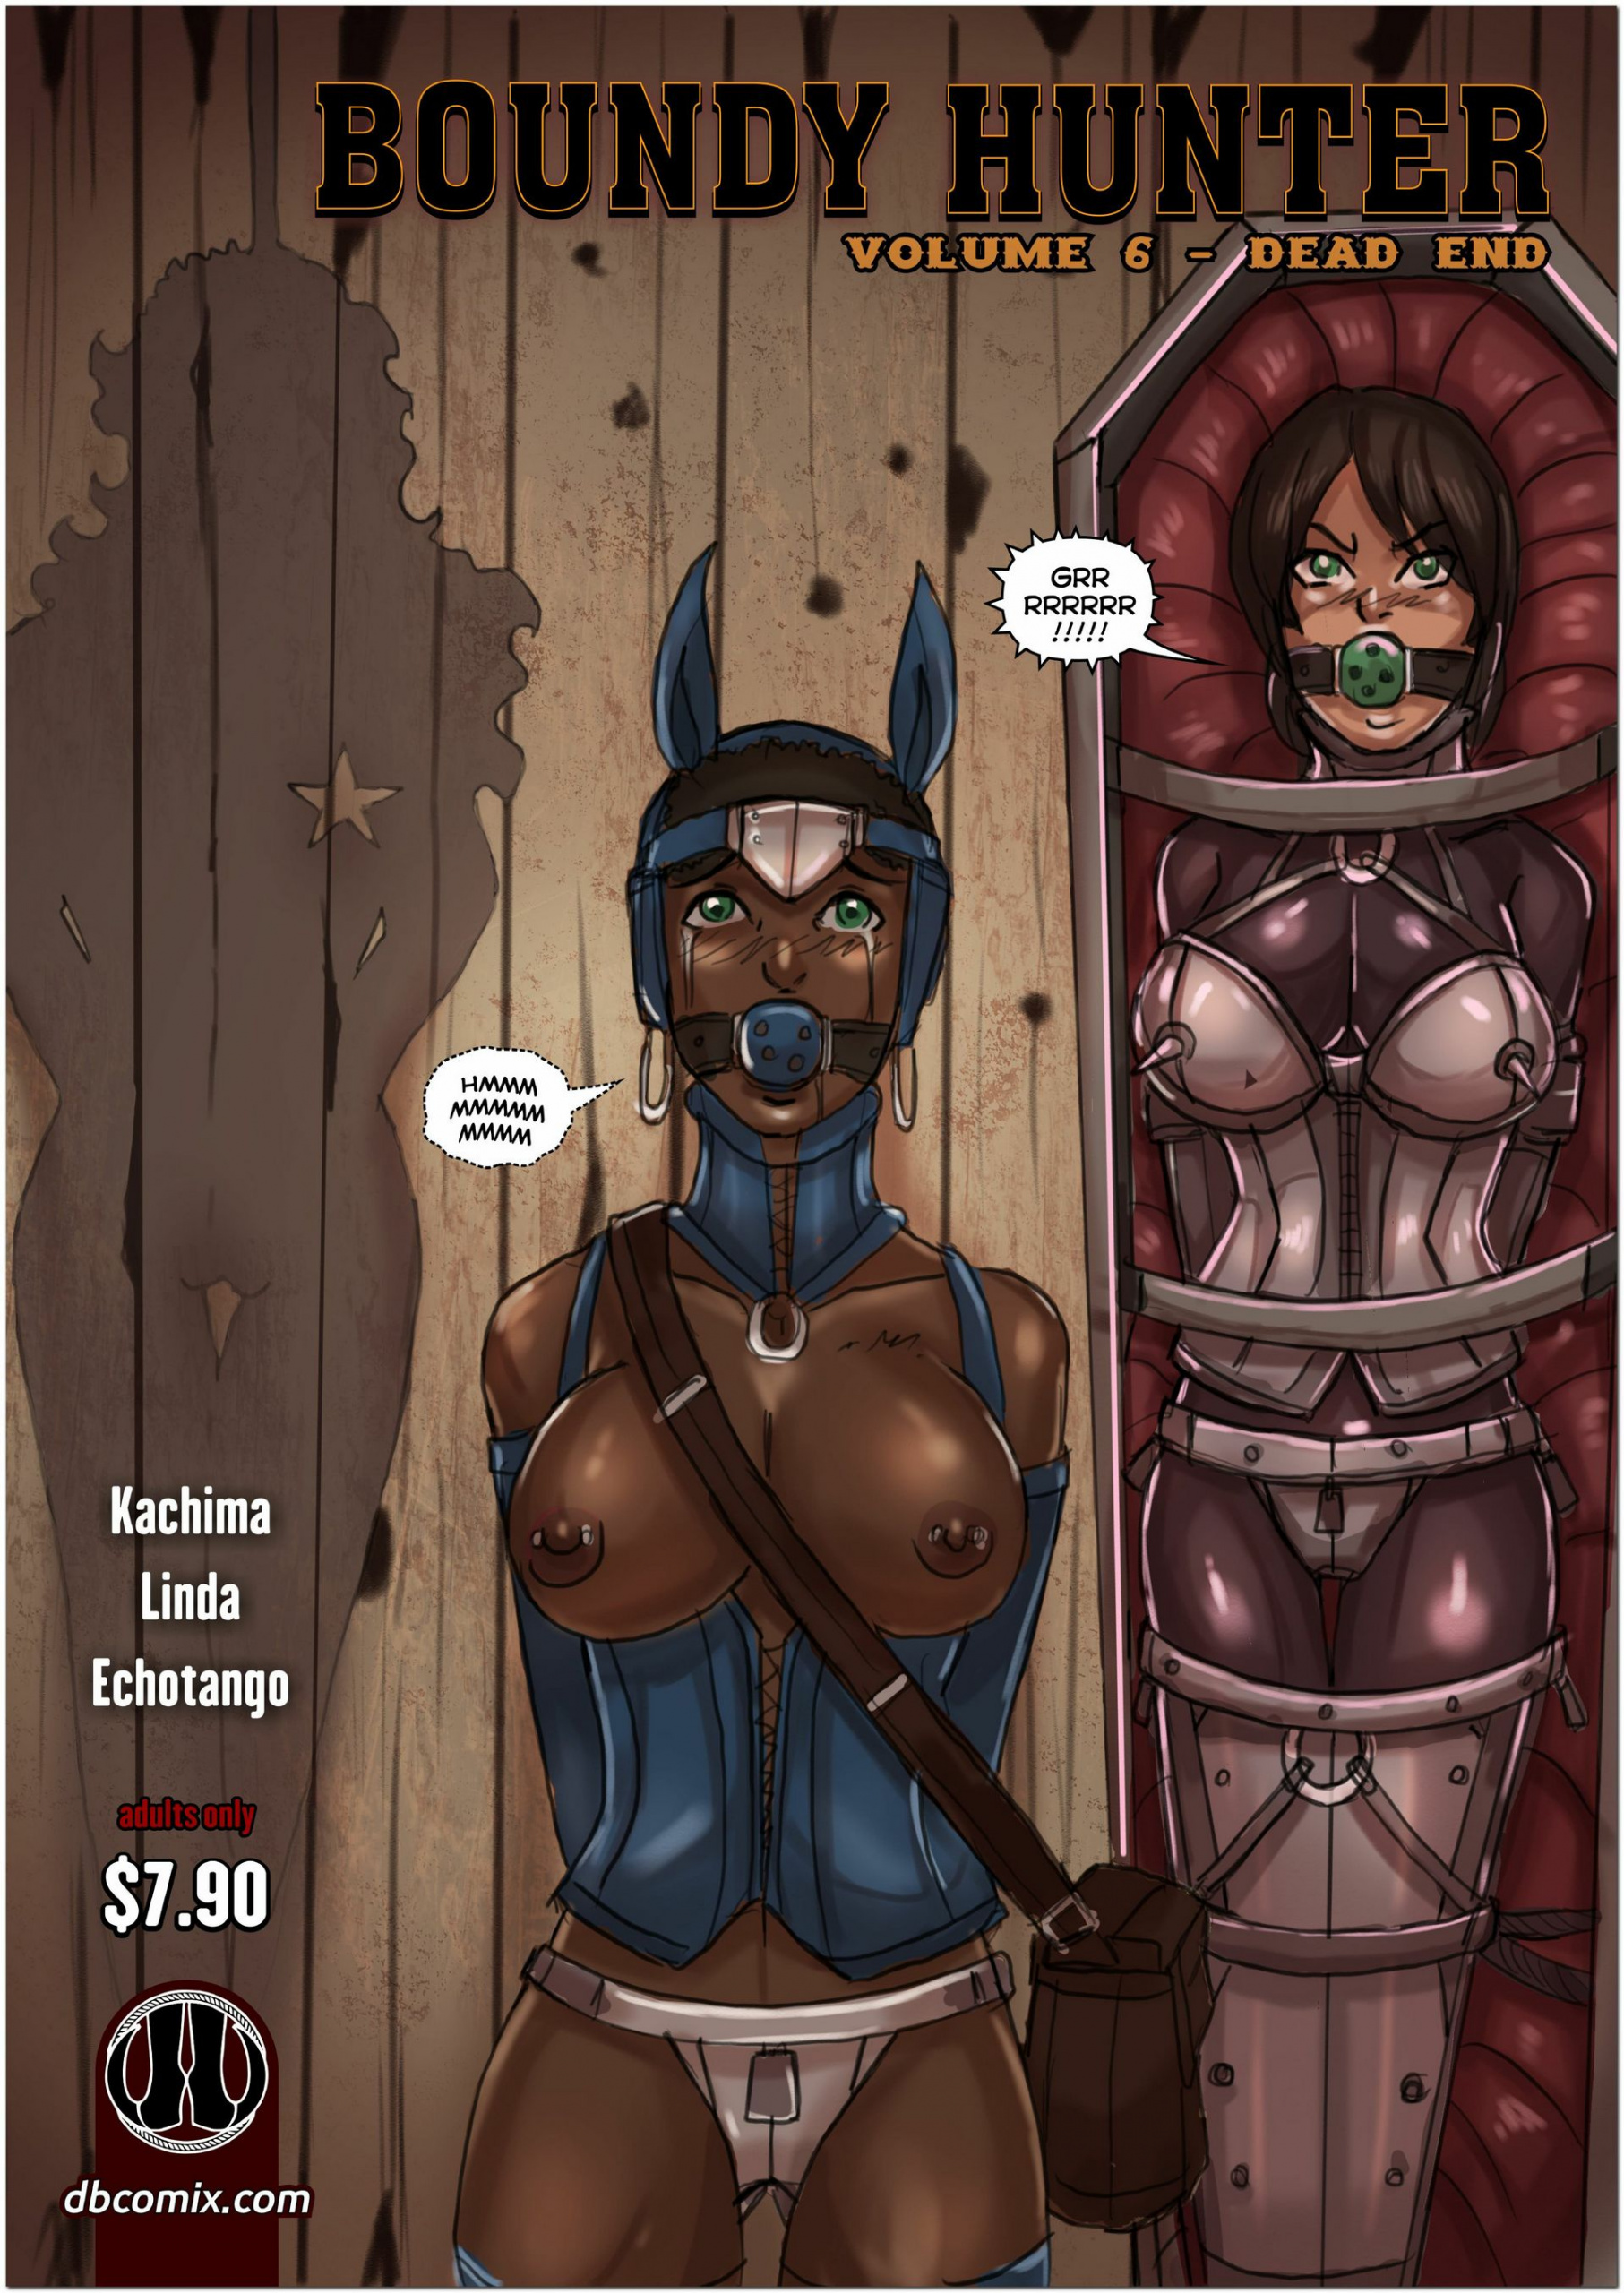 Boundy Hunter 1-9 porn comics Oral sex, Anal Sex, BDSM, Group Sex, Hardcore, Kidnapping, Latex, Masturbation, Rape, Sex Toys, Stockings